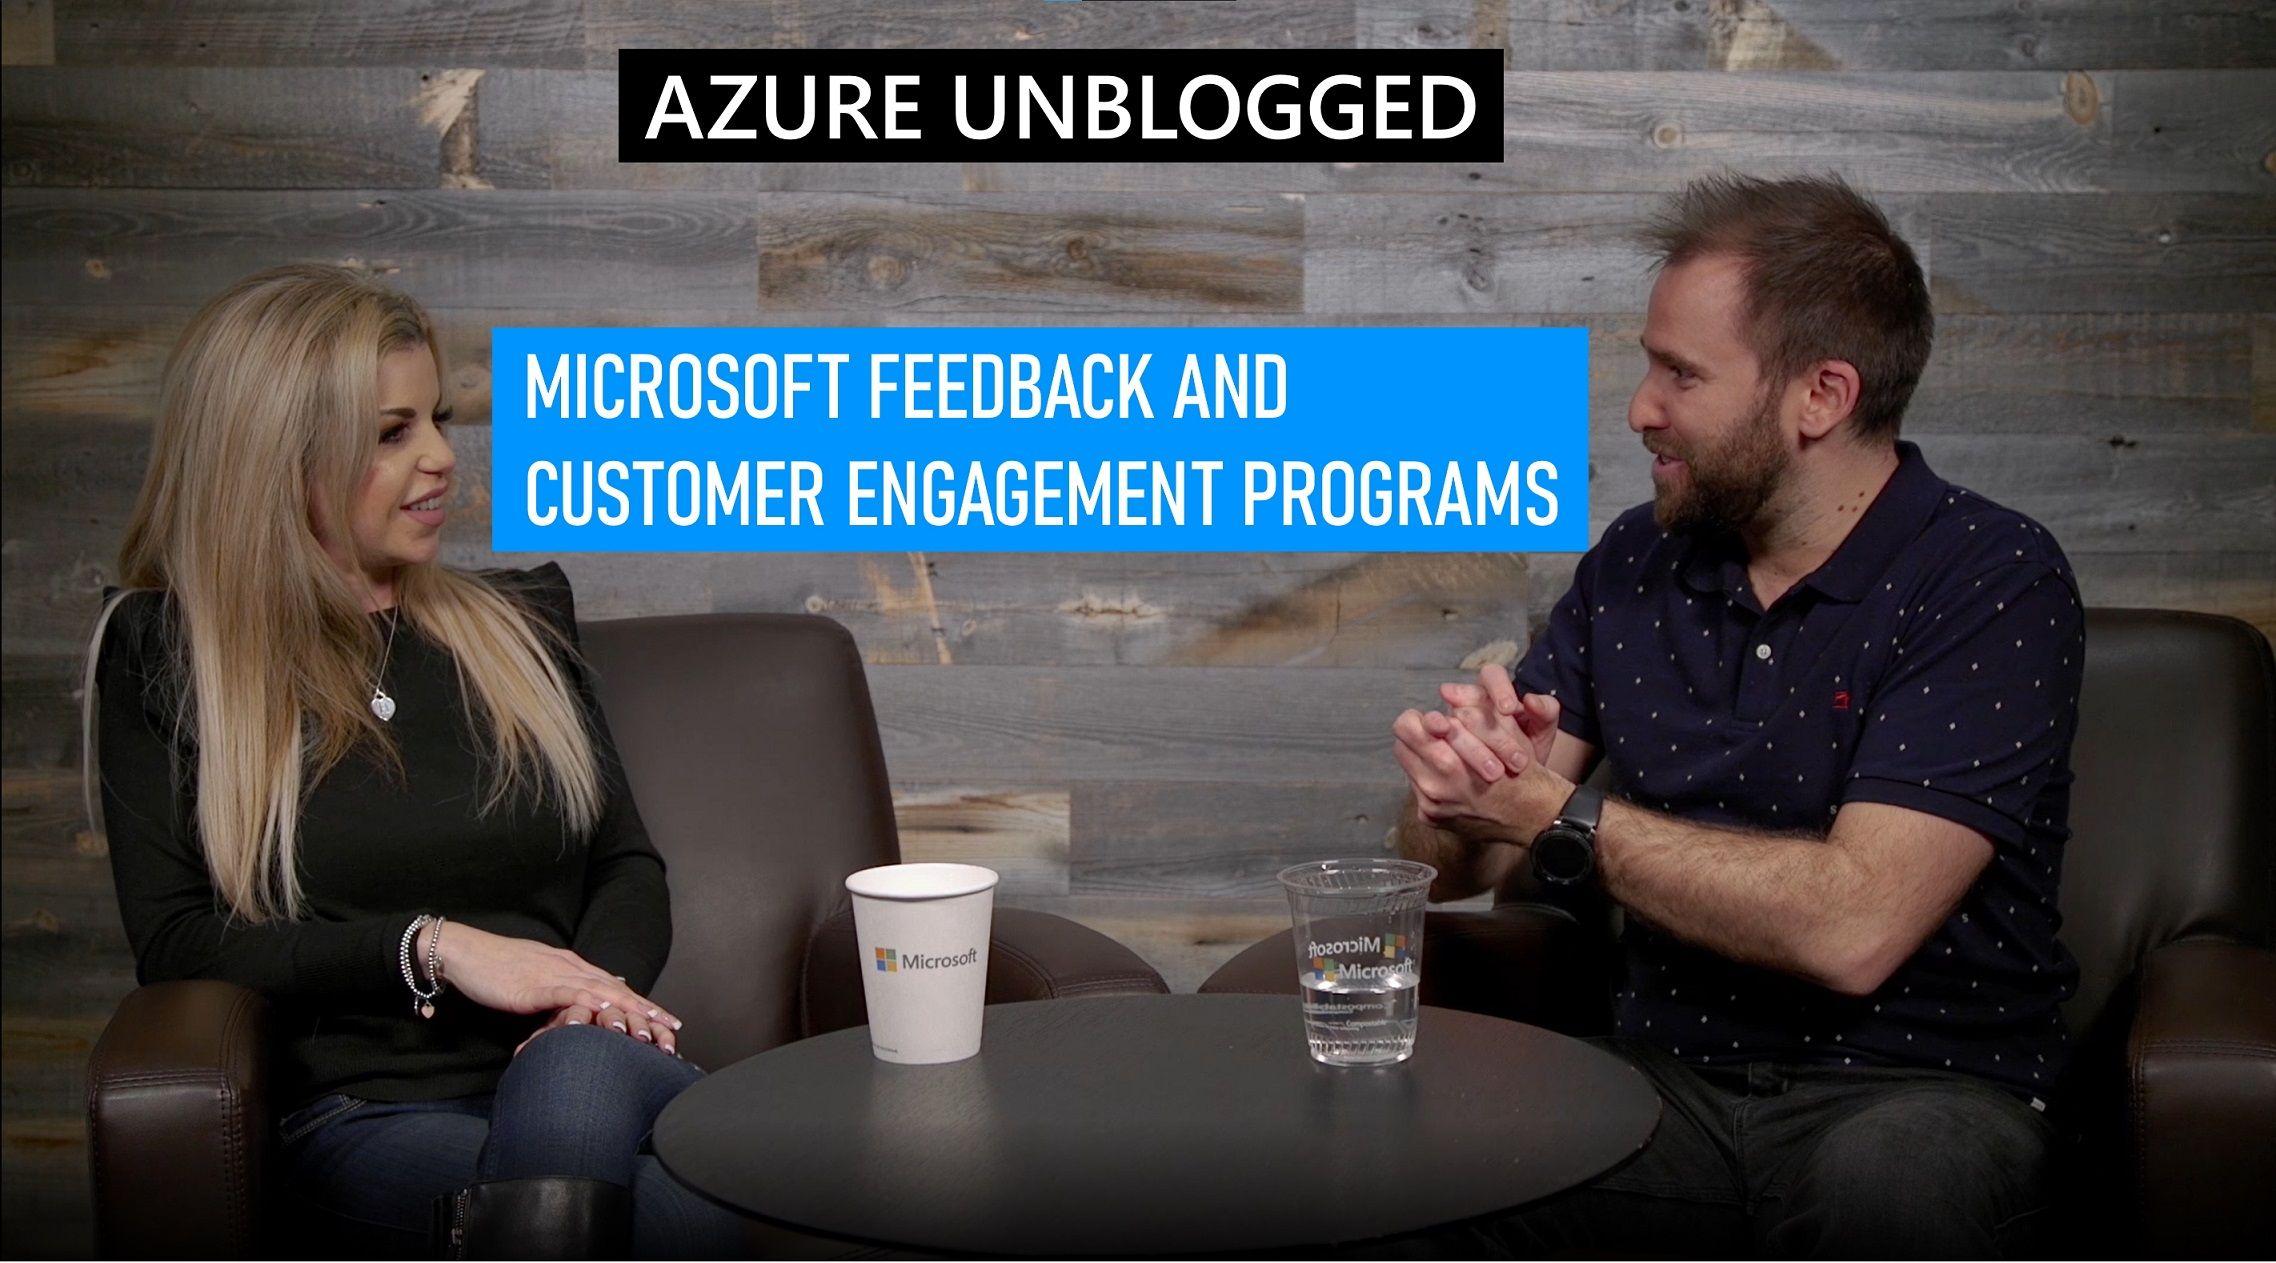 Azure Unblogged - Microsoft Feedback and Customer engagement programs